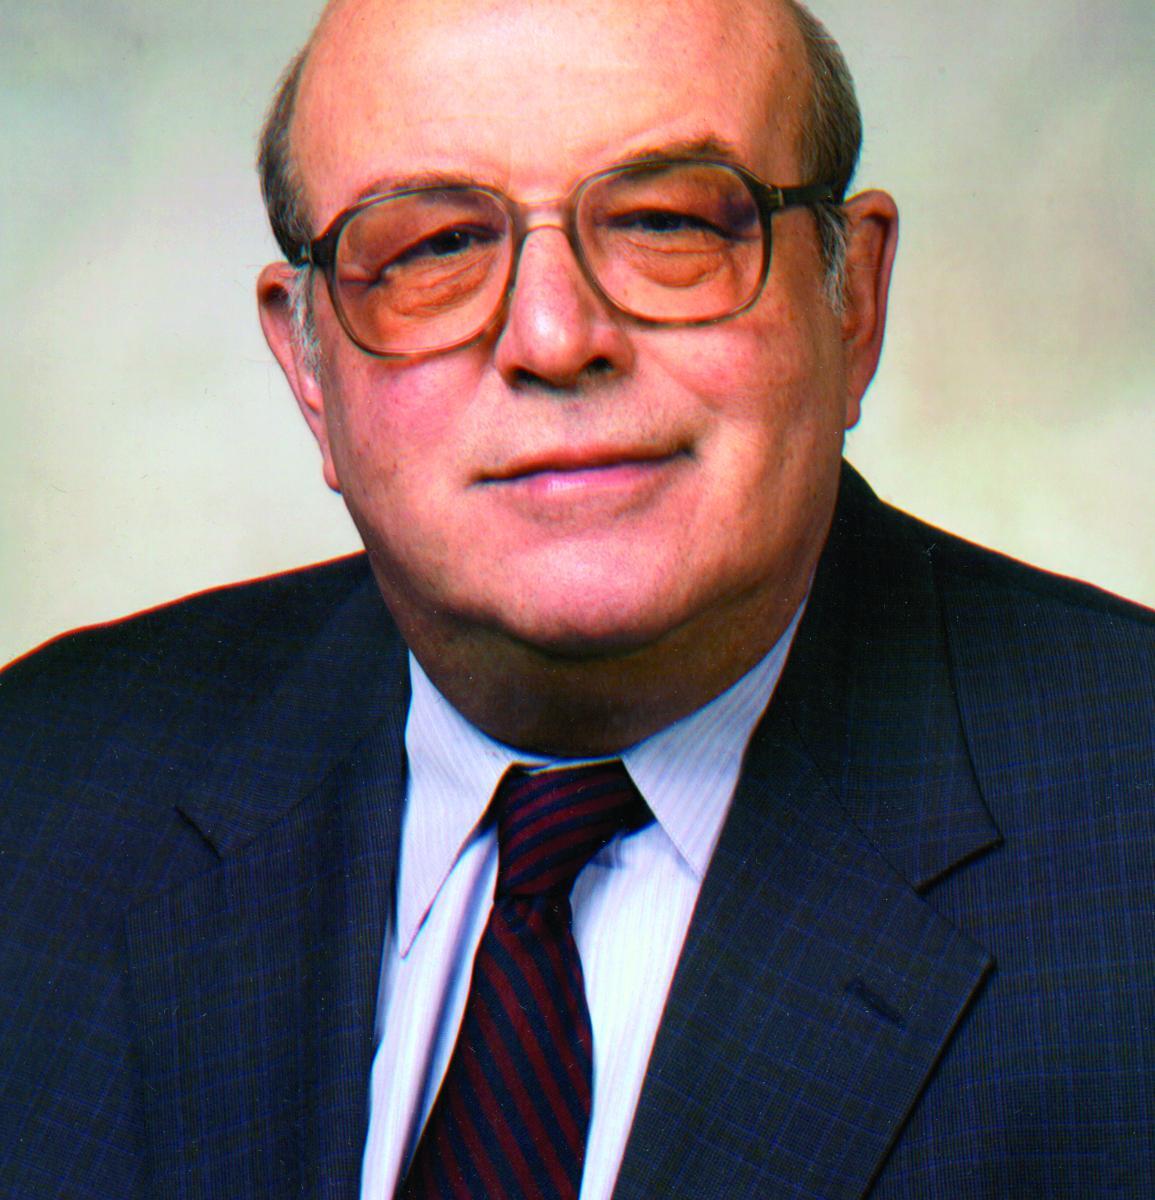 Ralph Raico